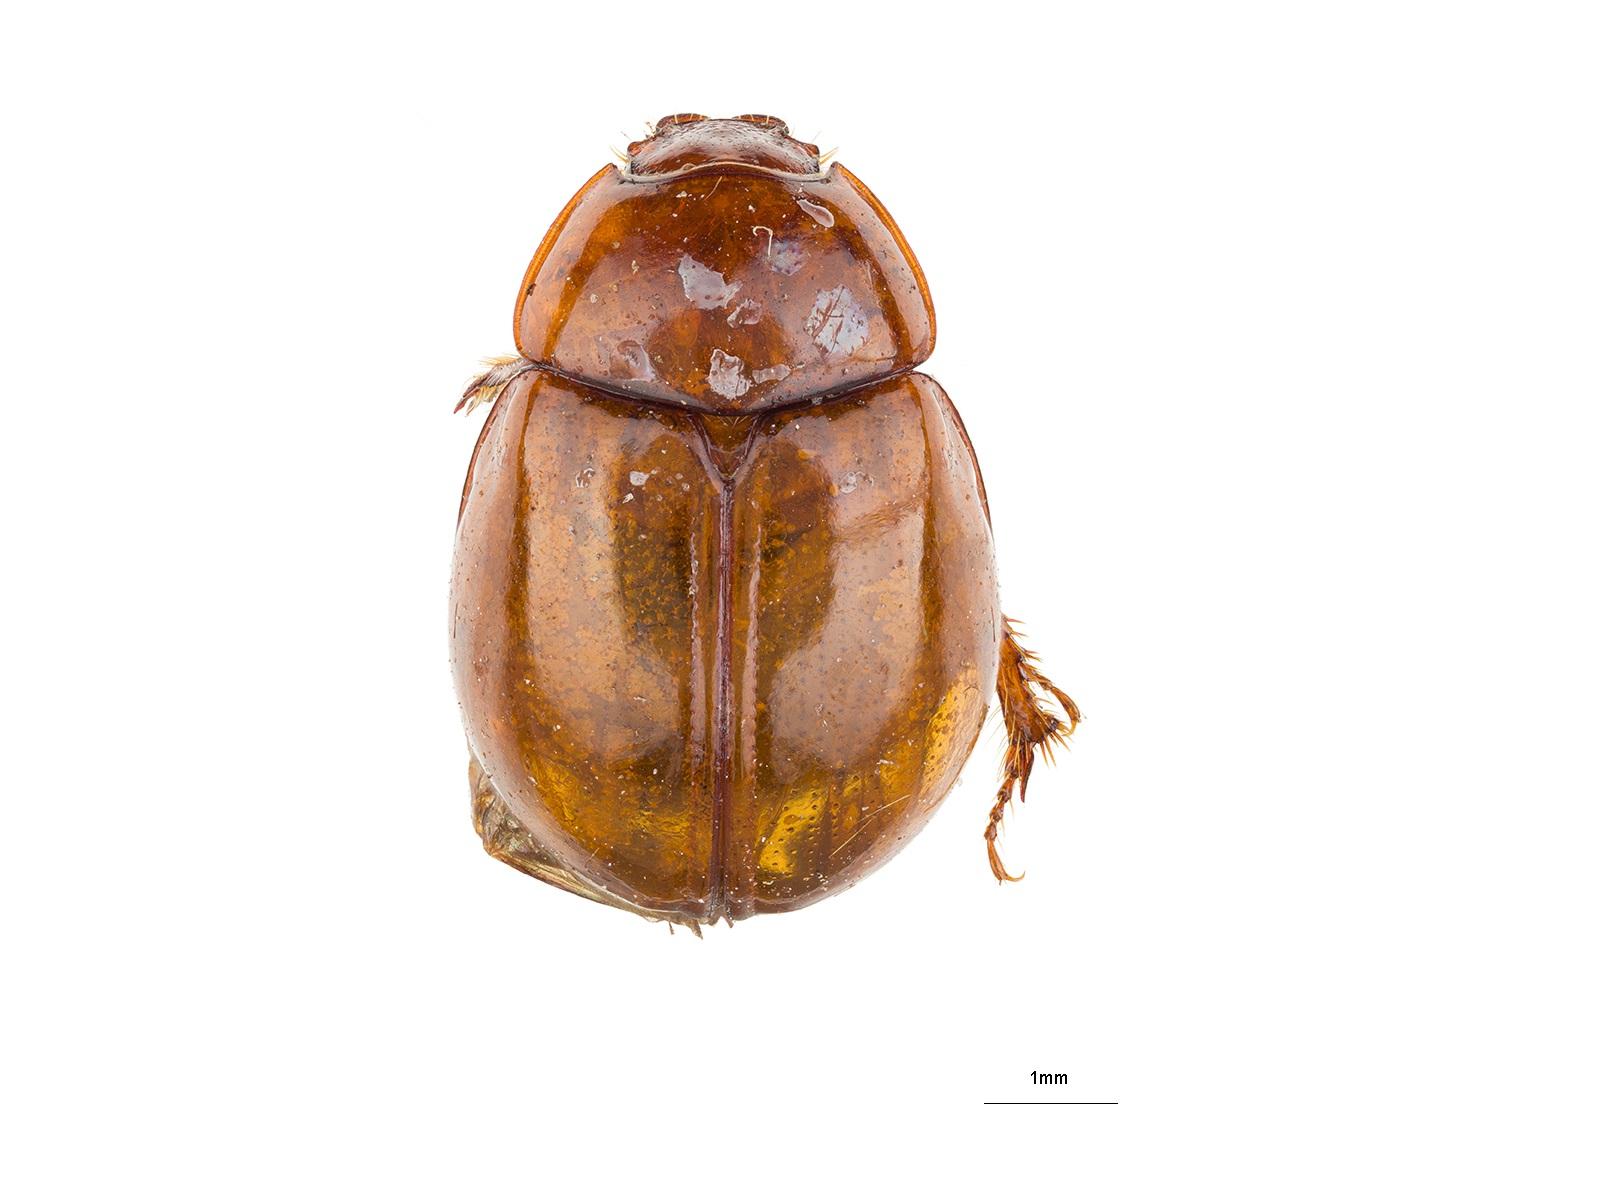 Coilodes castaneus Westwood, 1846